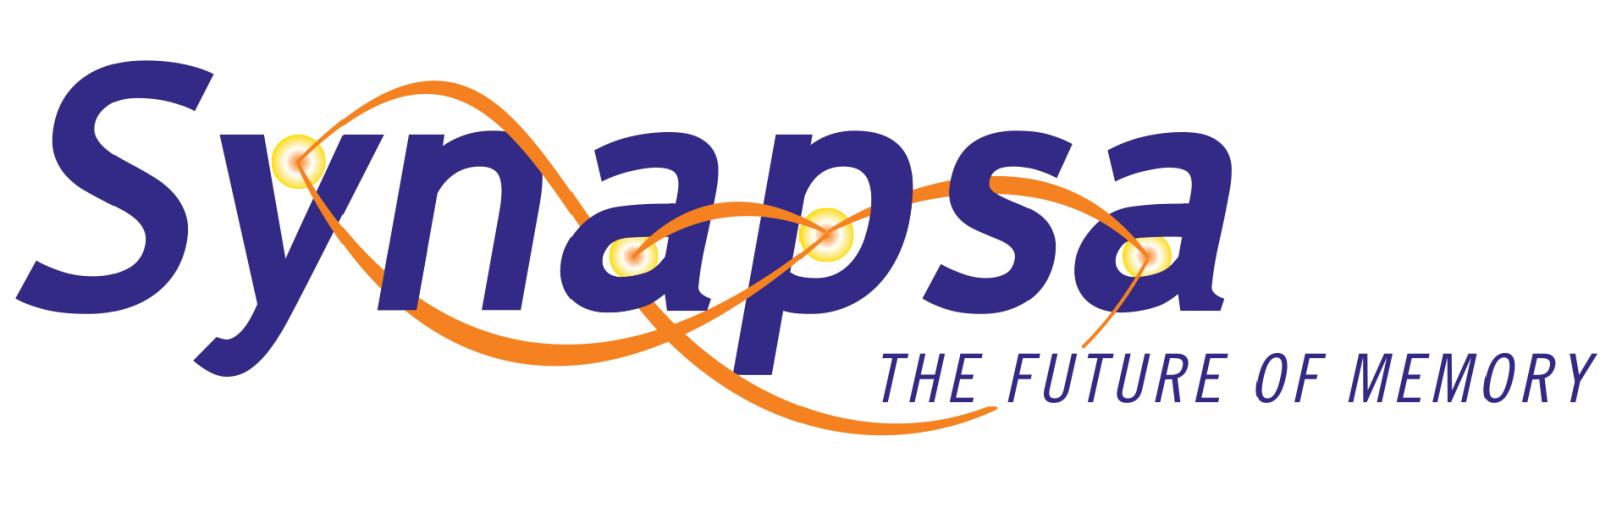 synapsa-logo-w-tag.png